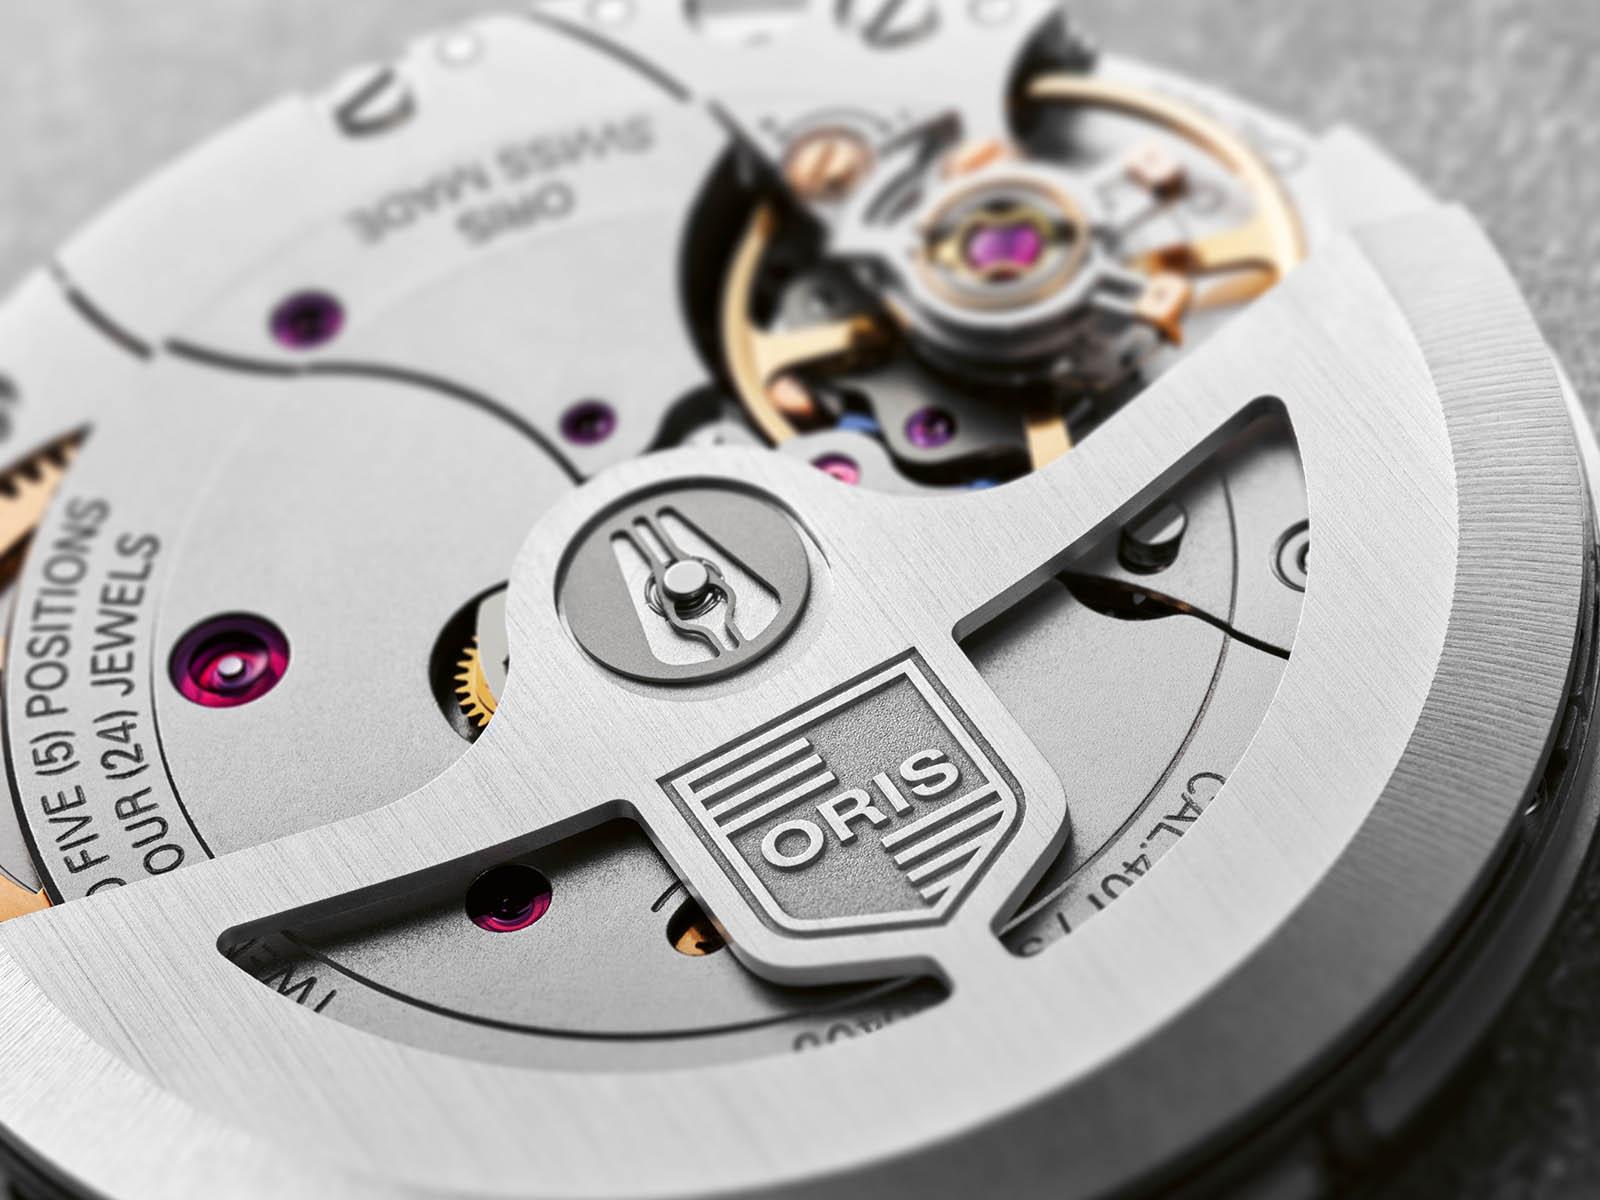 01-401-7764-3185-set-oris-carl-brashear-calibre-401-limited-edition-10.jpg